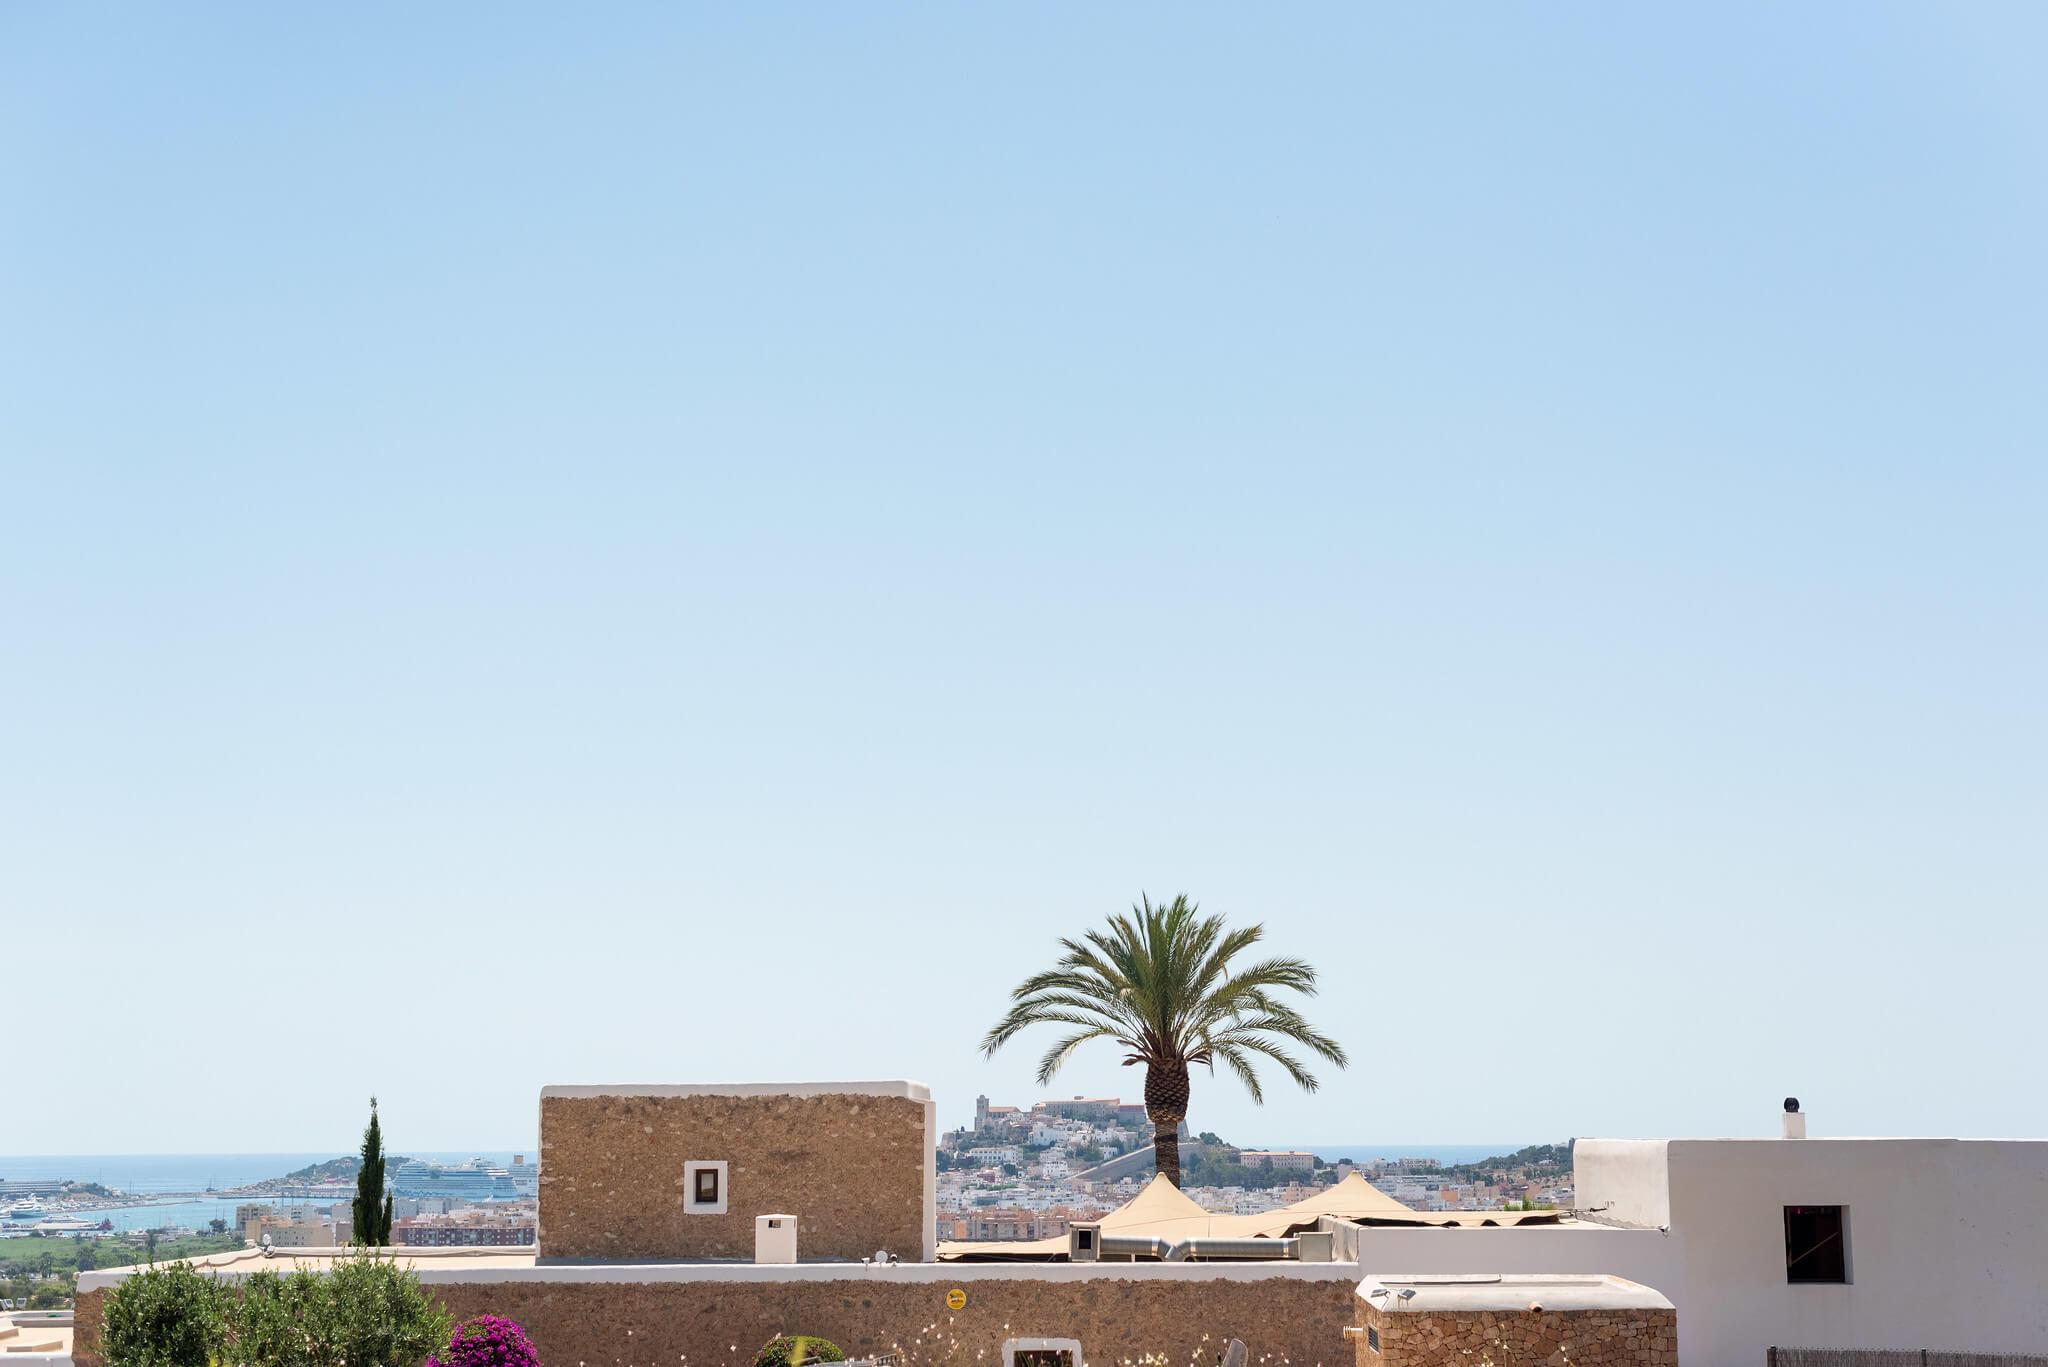 https://www.white-ibiza.com/wp-content/uploads/2020/03/white-ibiza-boutique-hotels-casa-maca-2020-09.jpg